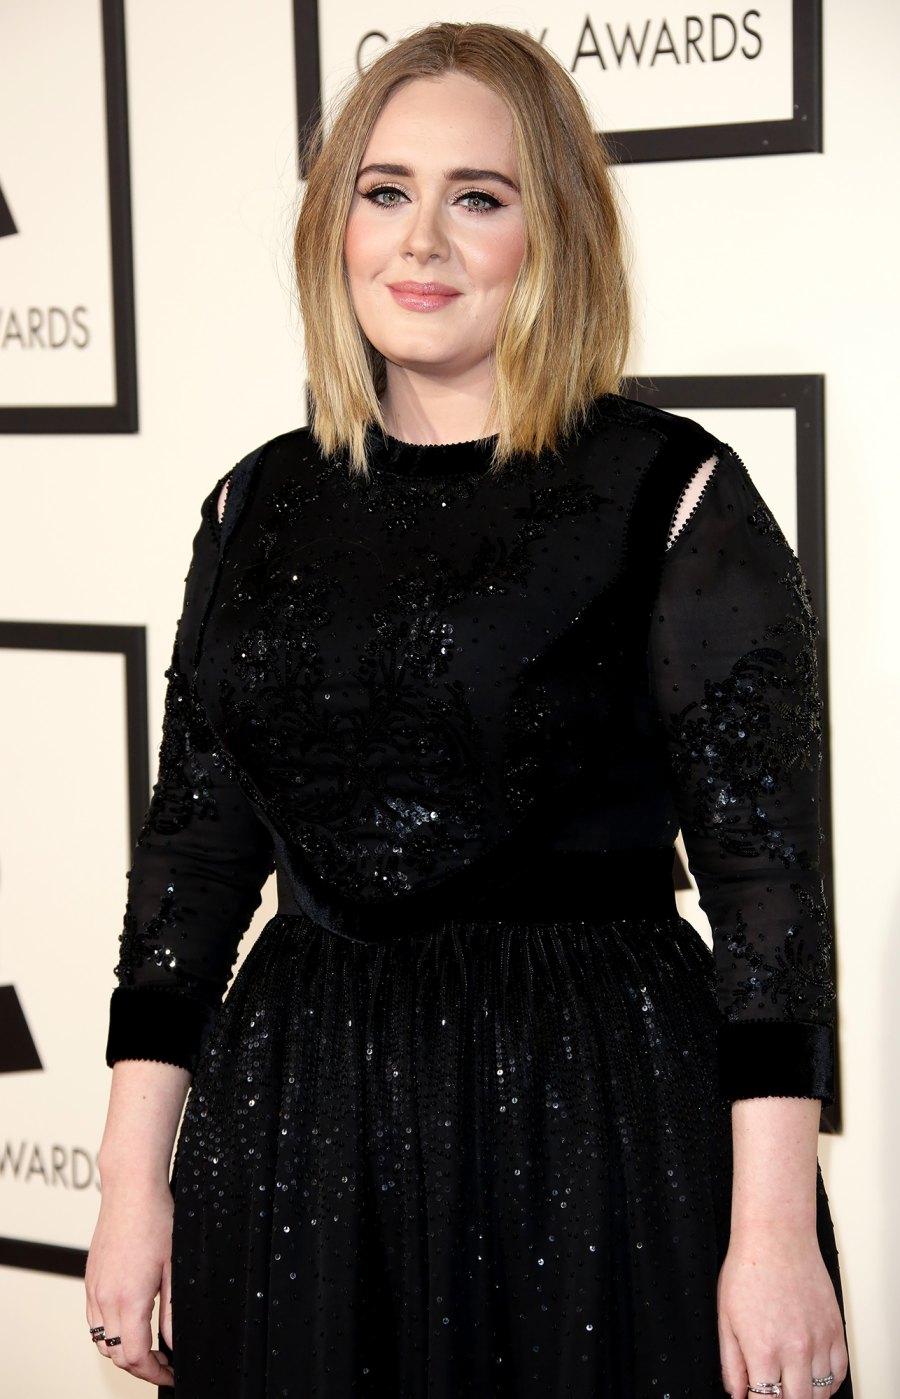 Adele Will Make Hosting Debut on 'Saturday Night Live' Next Week